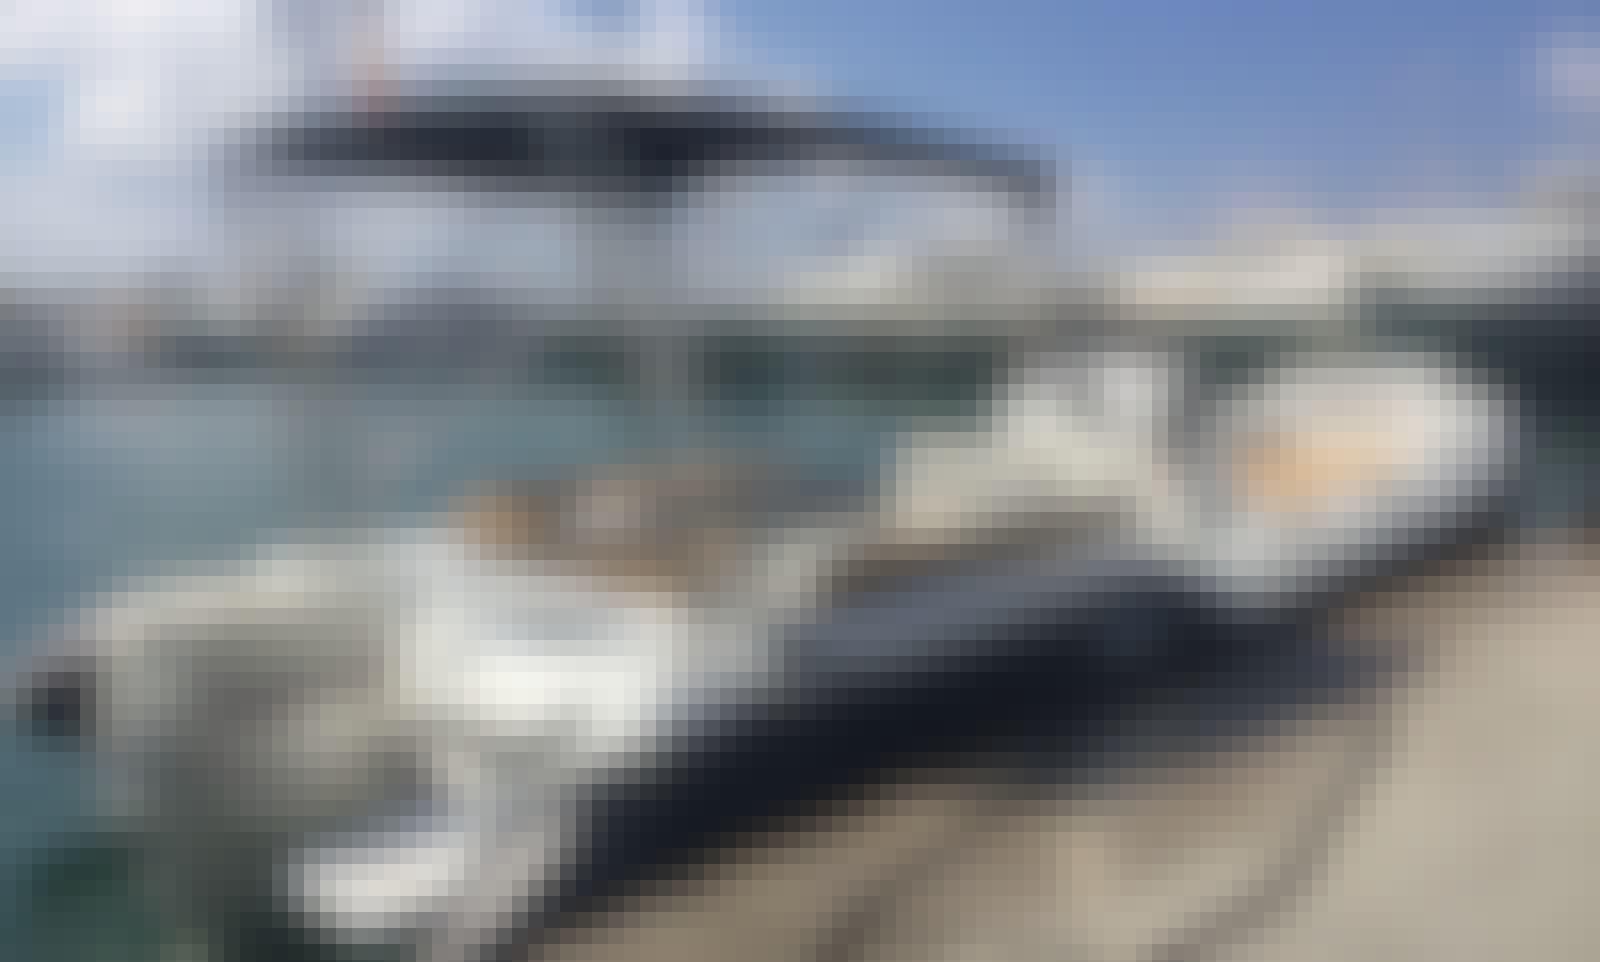 2018 Tarpon 790 LX RIB Rental In Eivissa, Spain